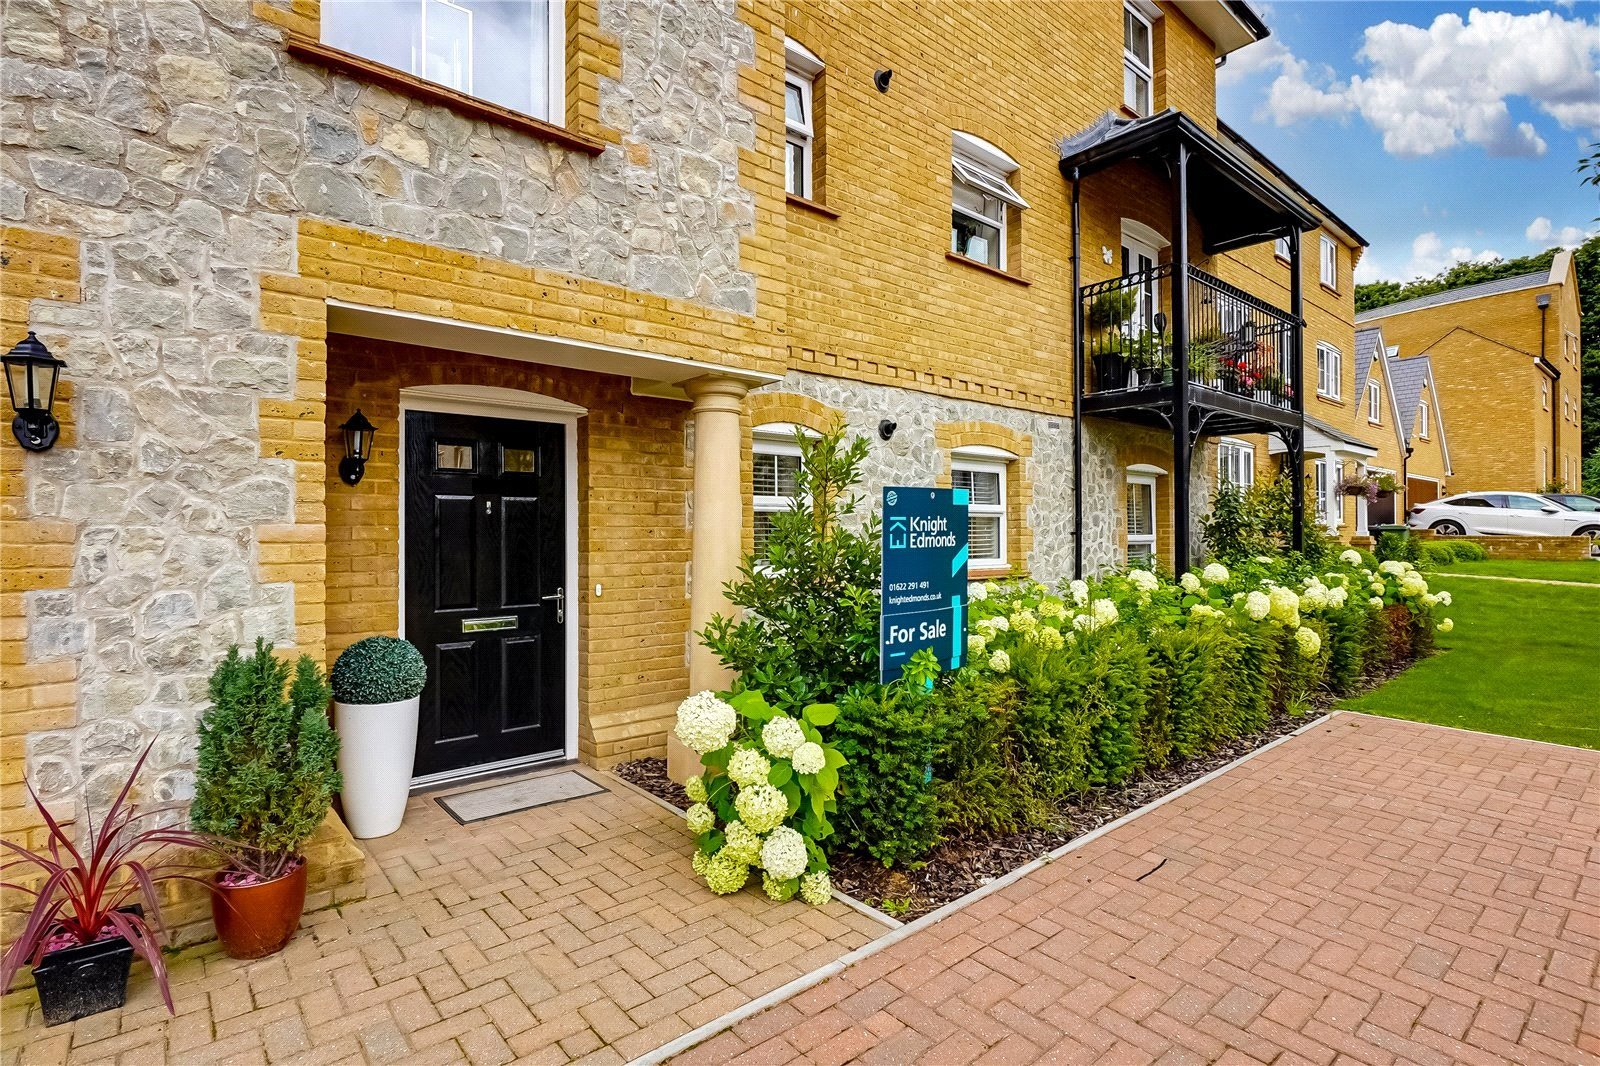 2 bed apartment for sale in Chapelfield Way, Allington, ME16